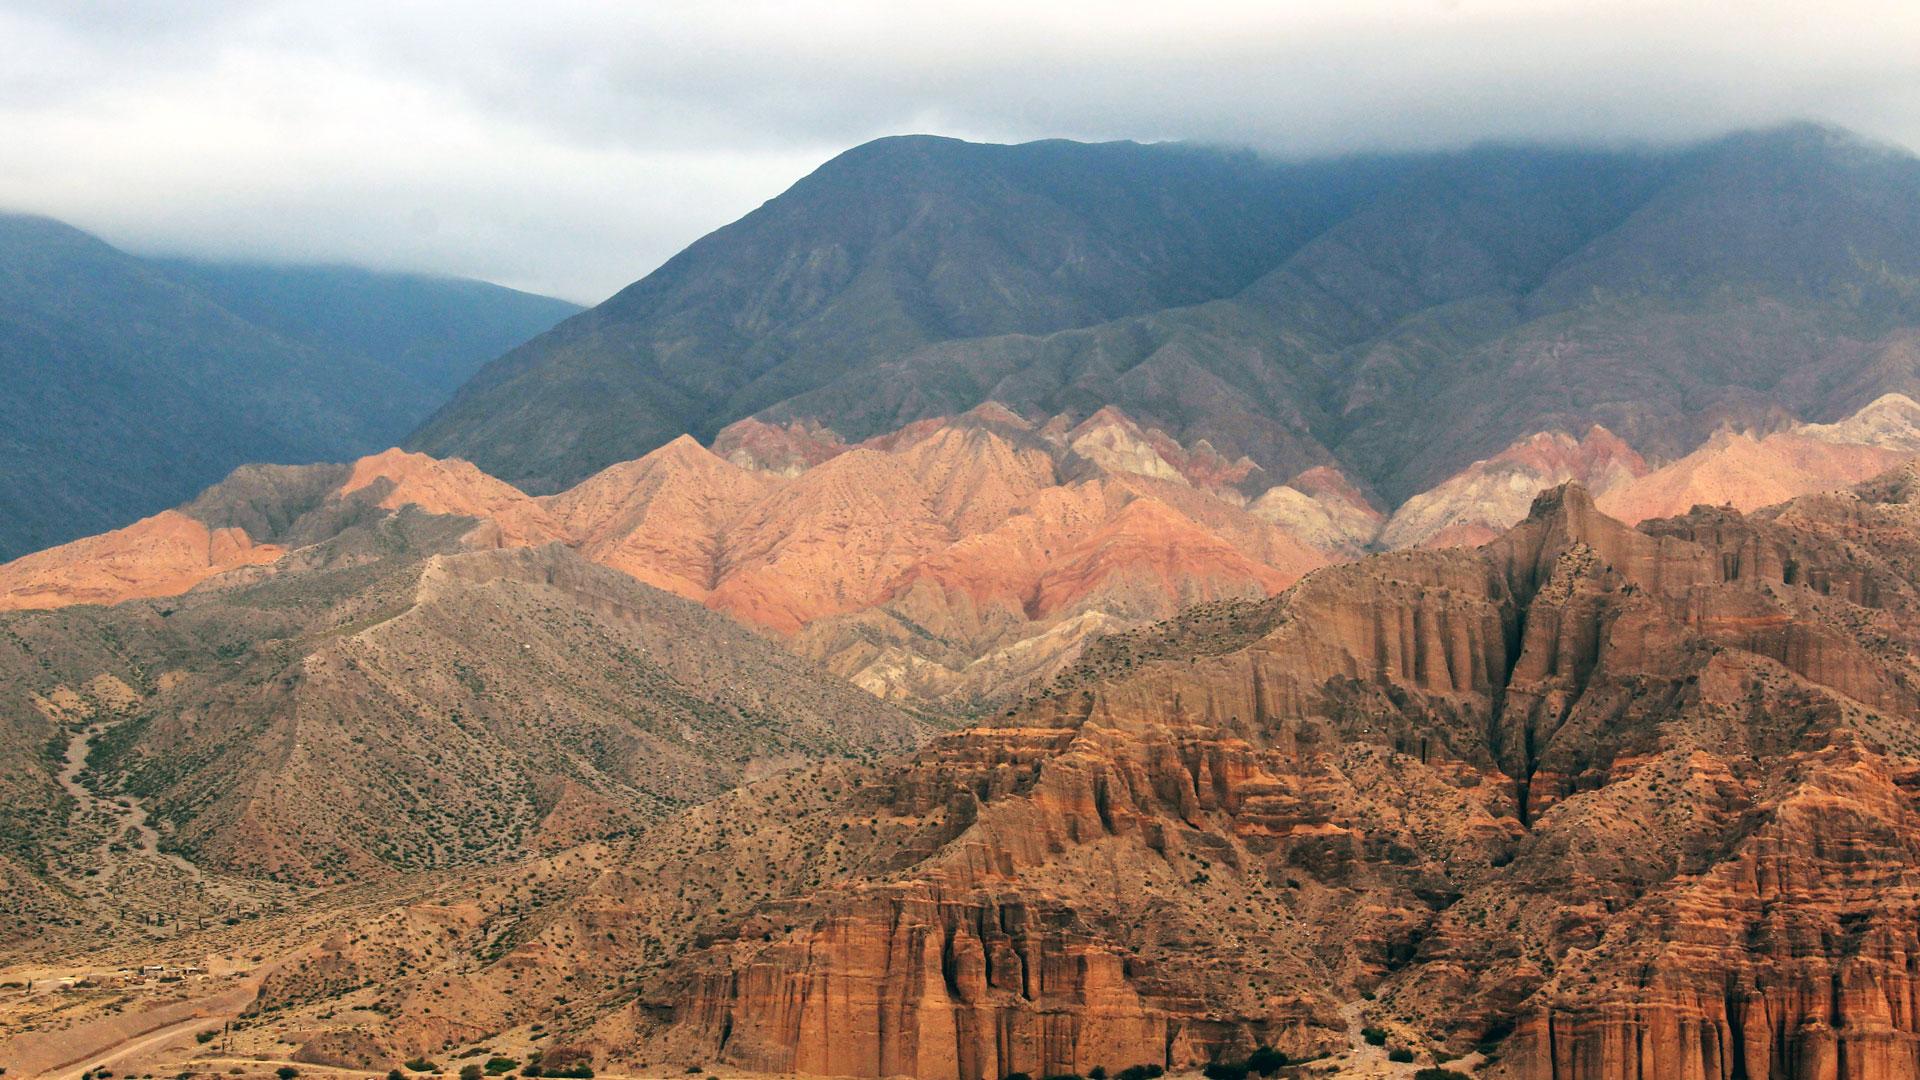 Quebrada de Humahuaca. Photo by Ovidiu Balaj